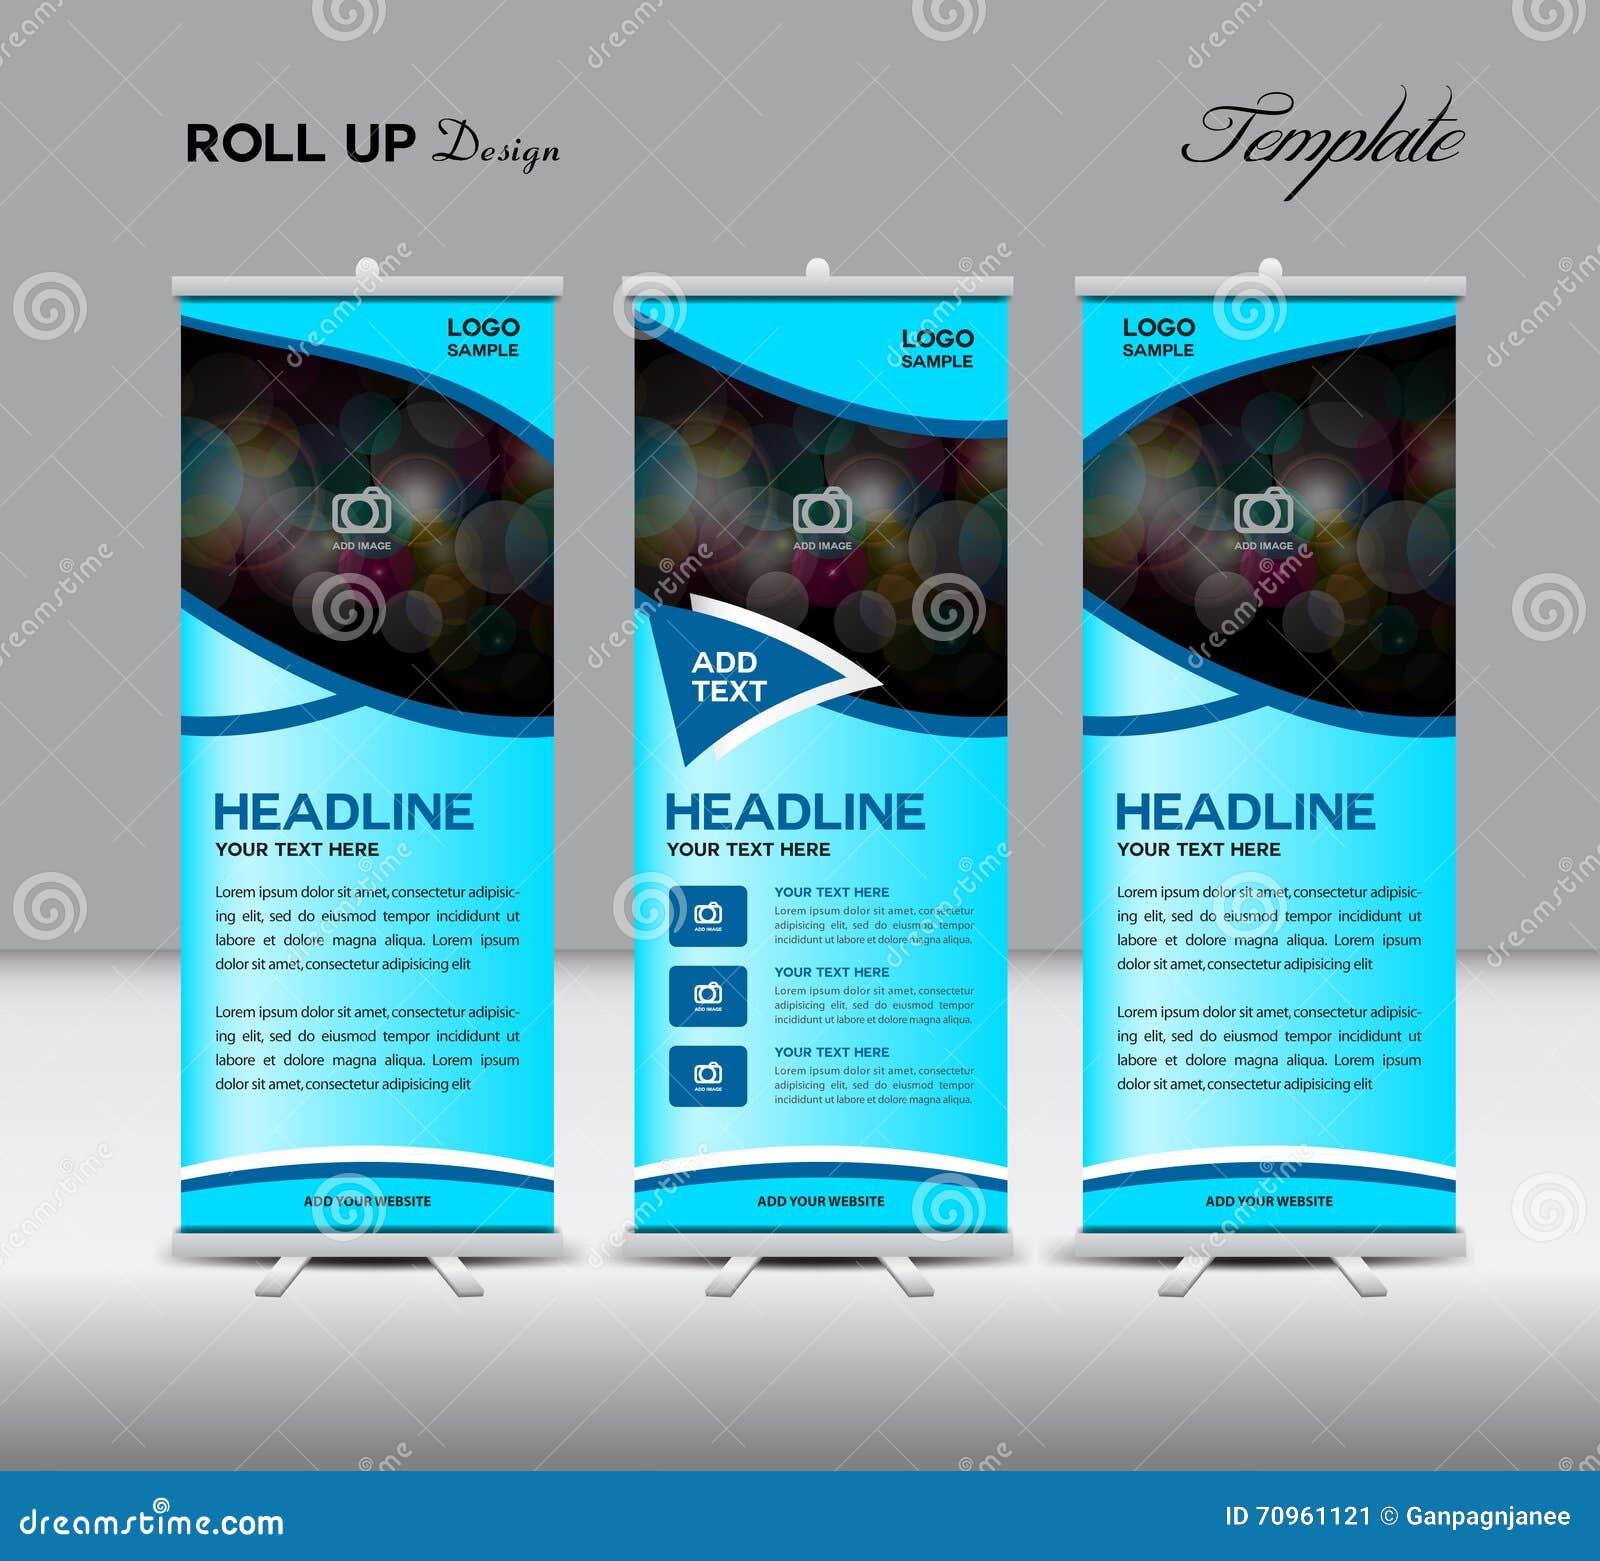 Design banner template - Blue Roll Up Banner Template Stand Template Design Banner Temp Stock Image